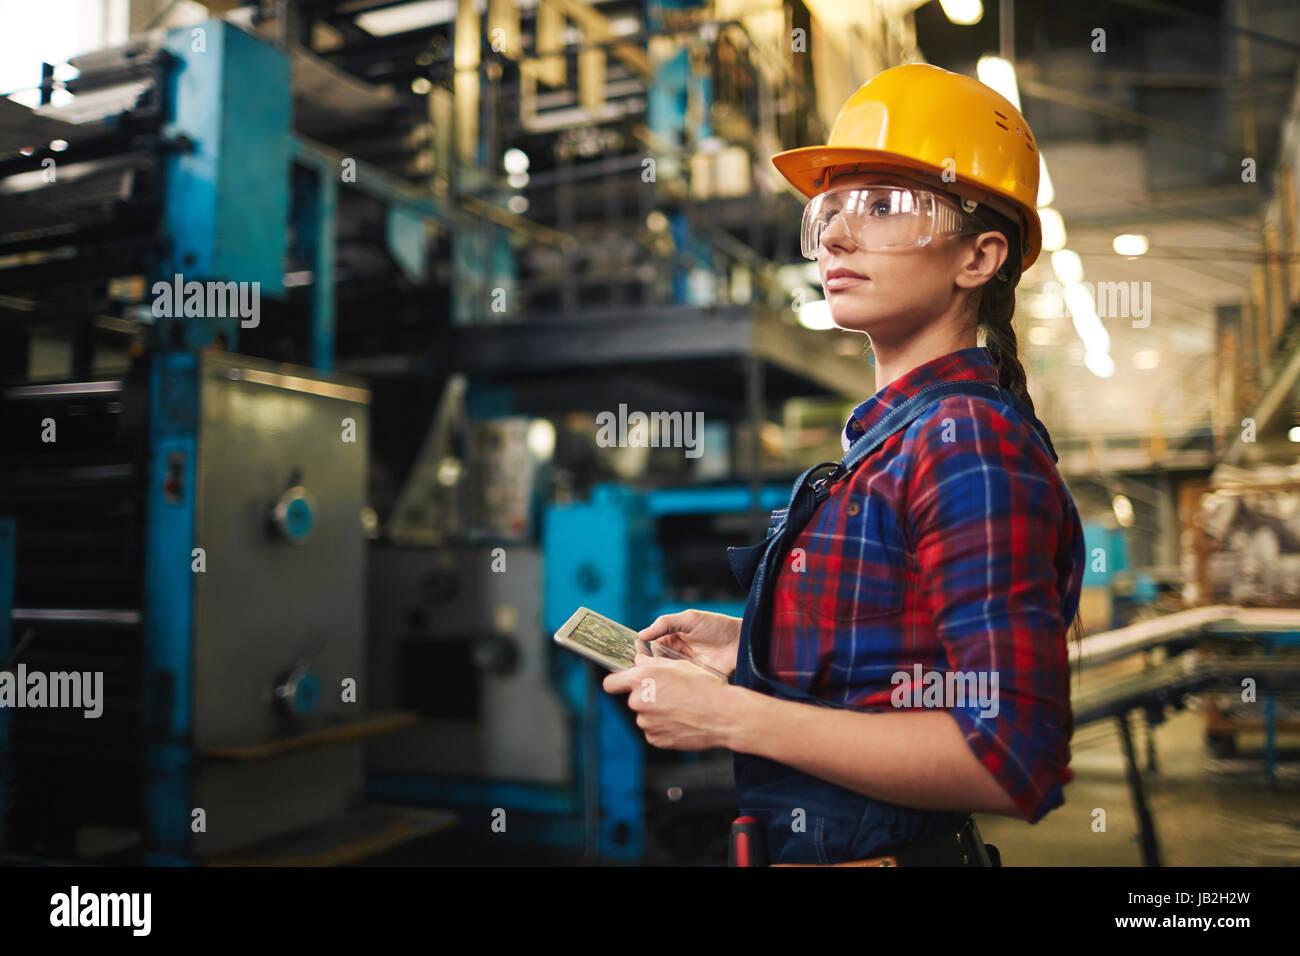 Female Employee Doing Checklist - Stock Image